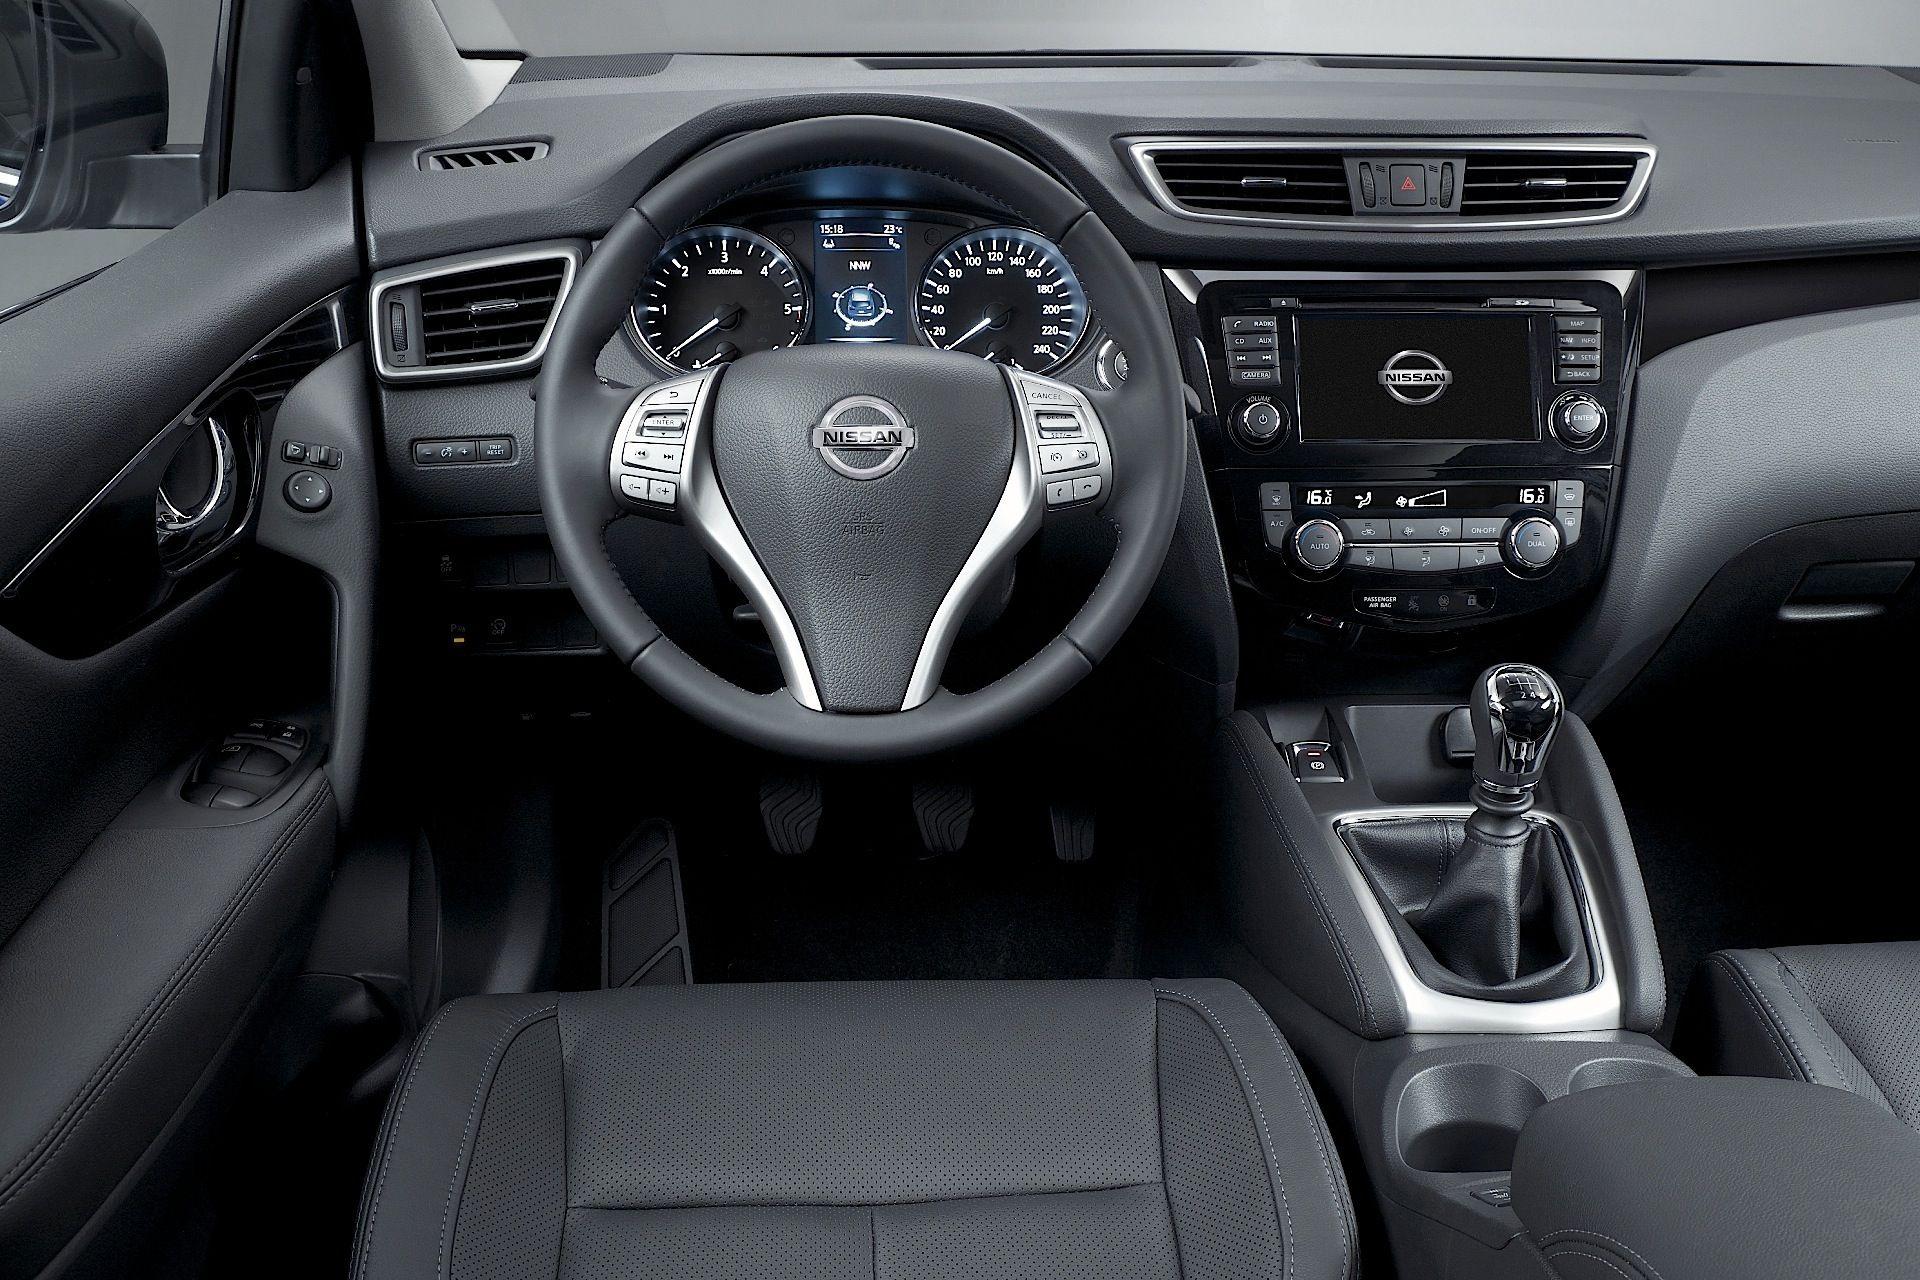 Nissan Qashqai Tekna interior | Nissan Qashqai | Pinterest | Nissan ...